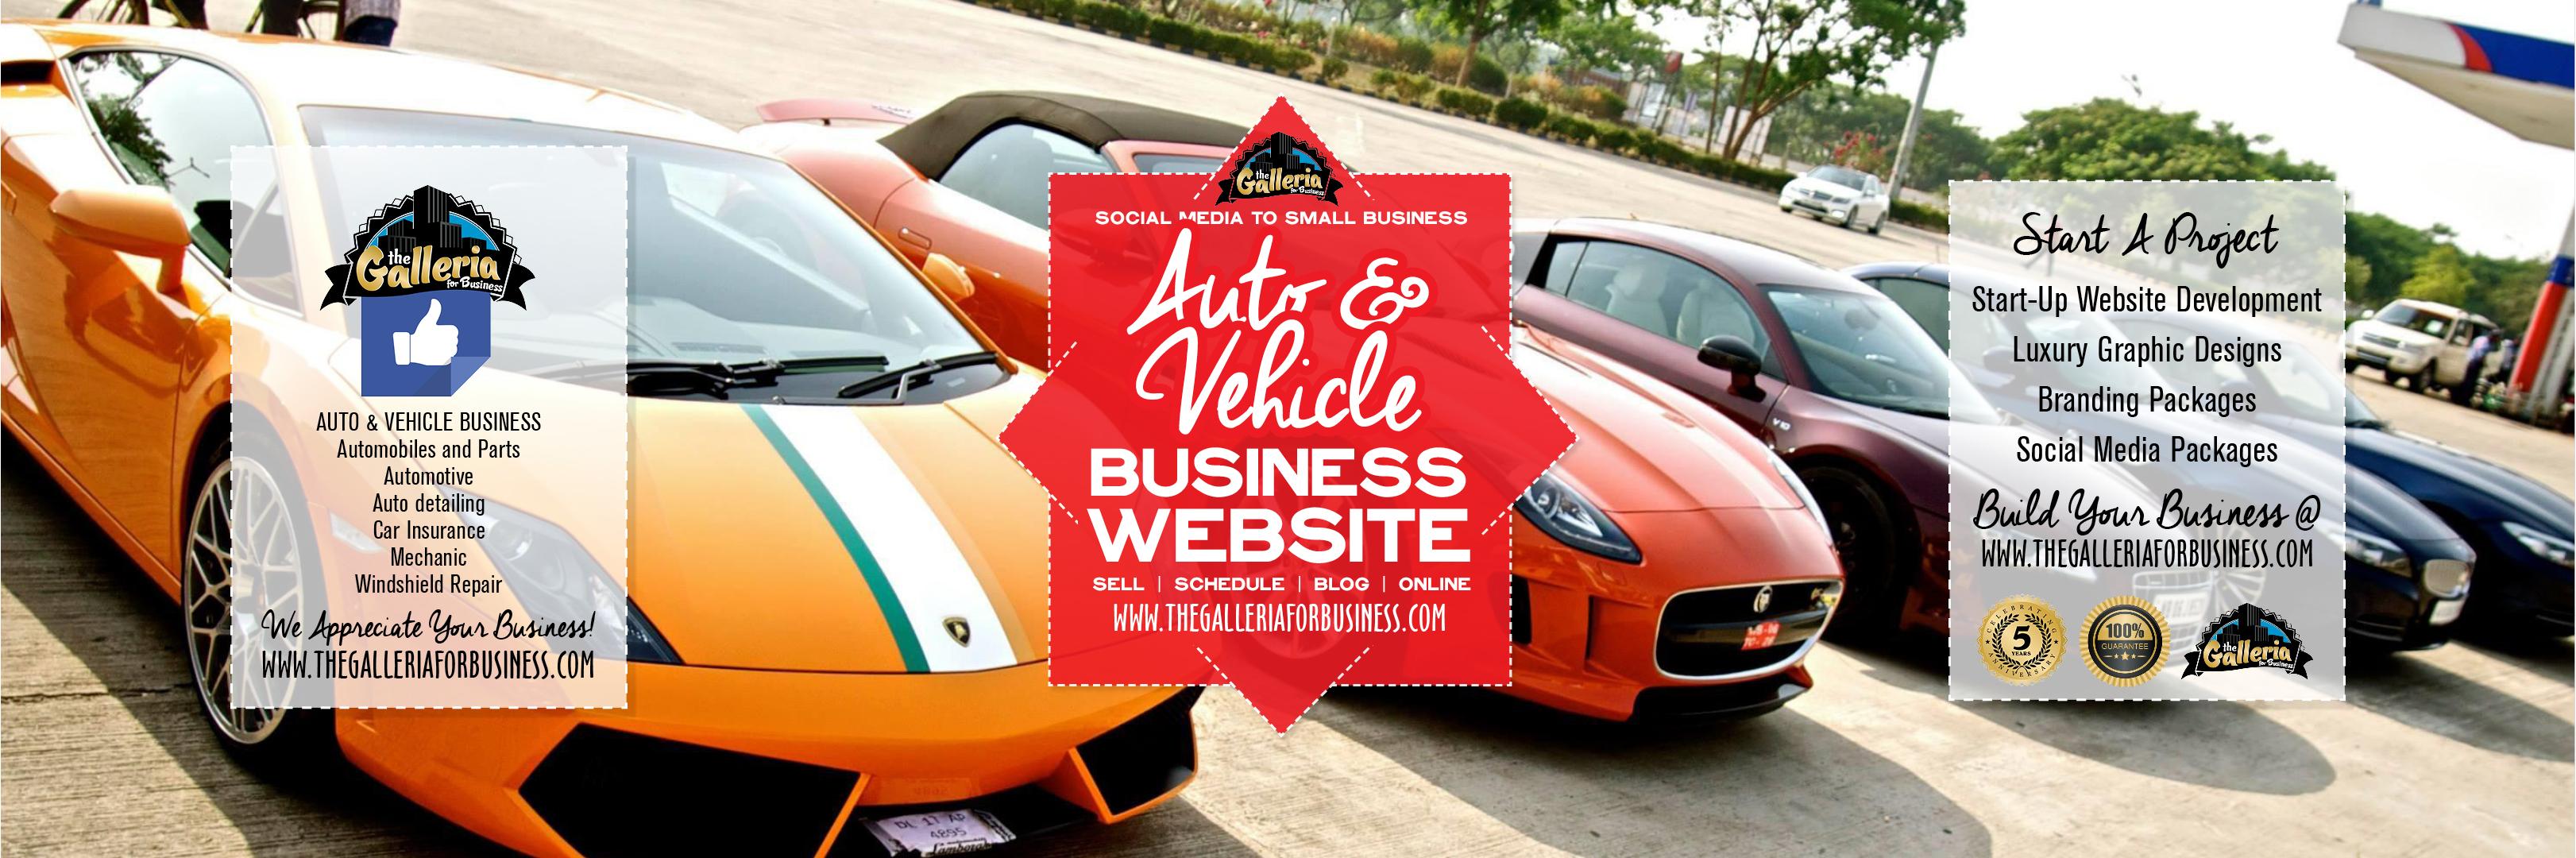 Auto & Vehicle Business